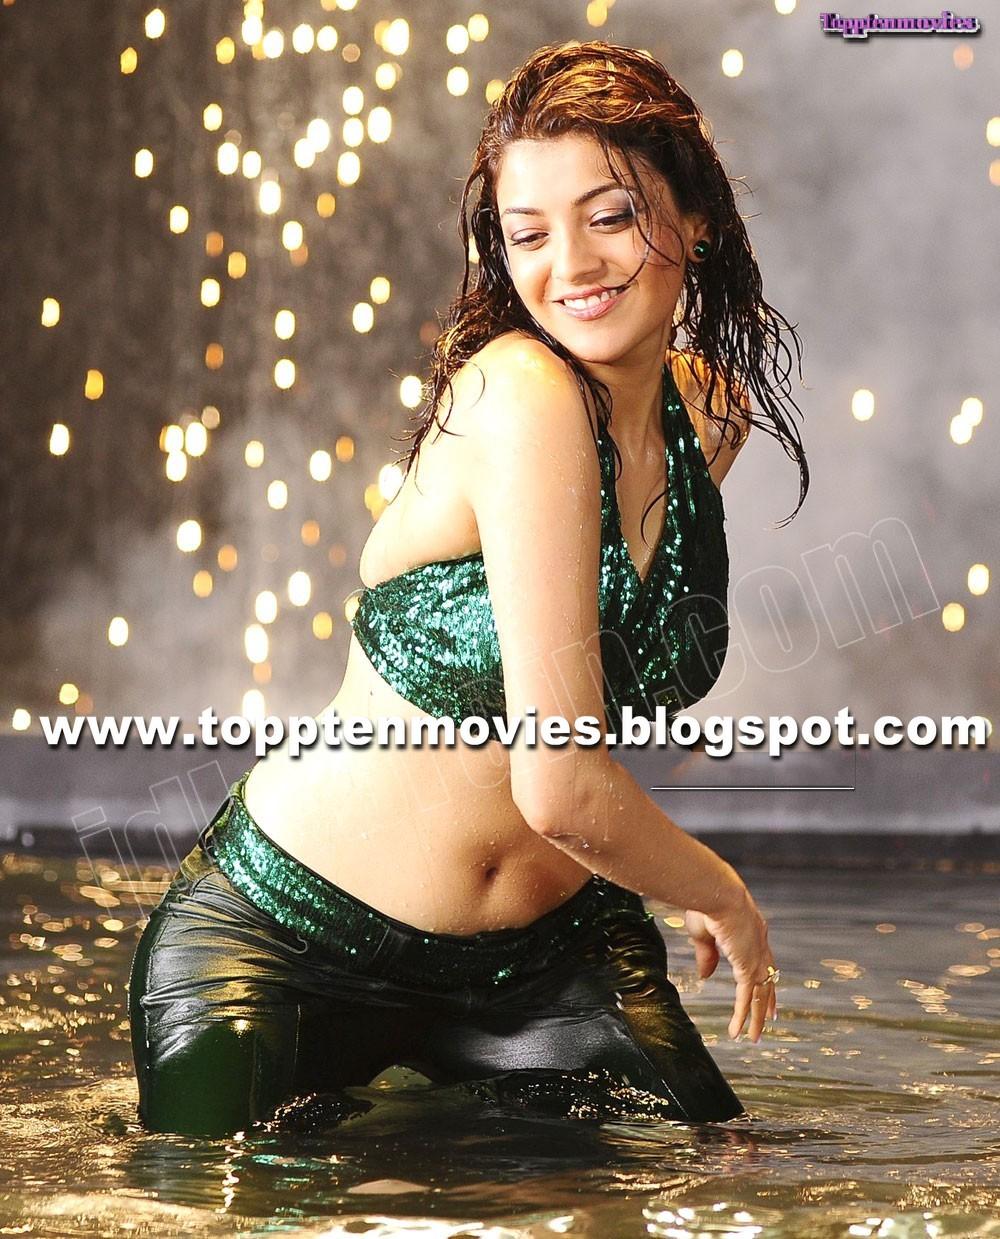 http://2.bp.blogspot.com/_iRqKBCtH6ZM/S_tyYEZojGI/AAAAAAAACHo/bBNDu1G9jYc/s1600/KajalAgarwal-Sexy-Navel-Show+%283%29.jpg